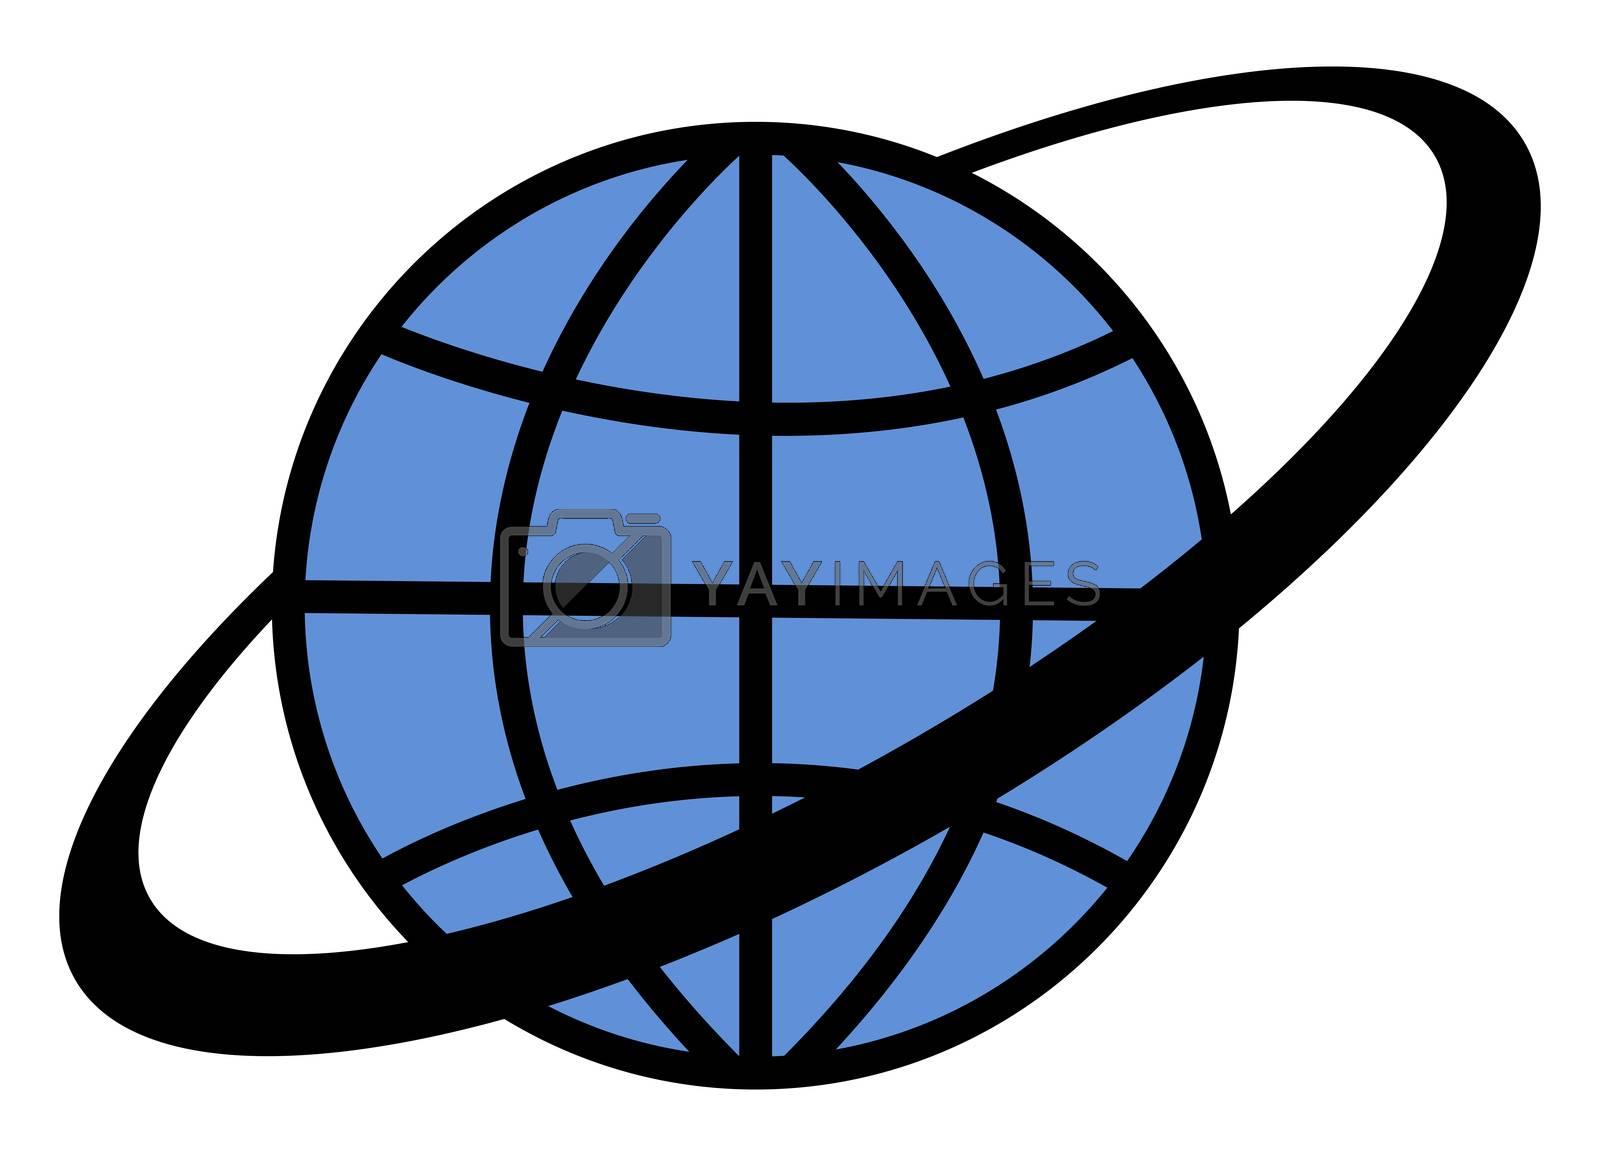 Globalization globe, illustration, vector on white background